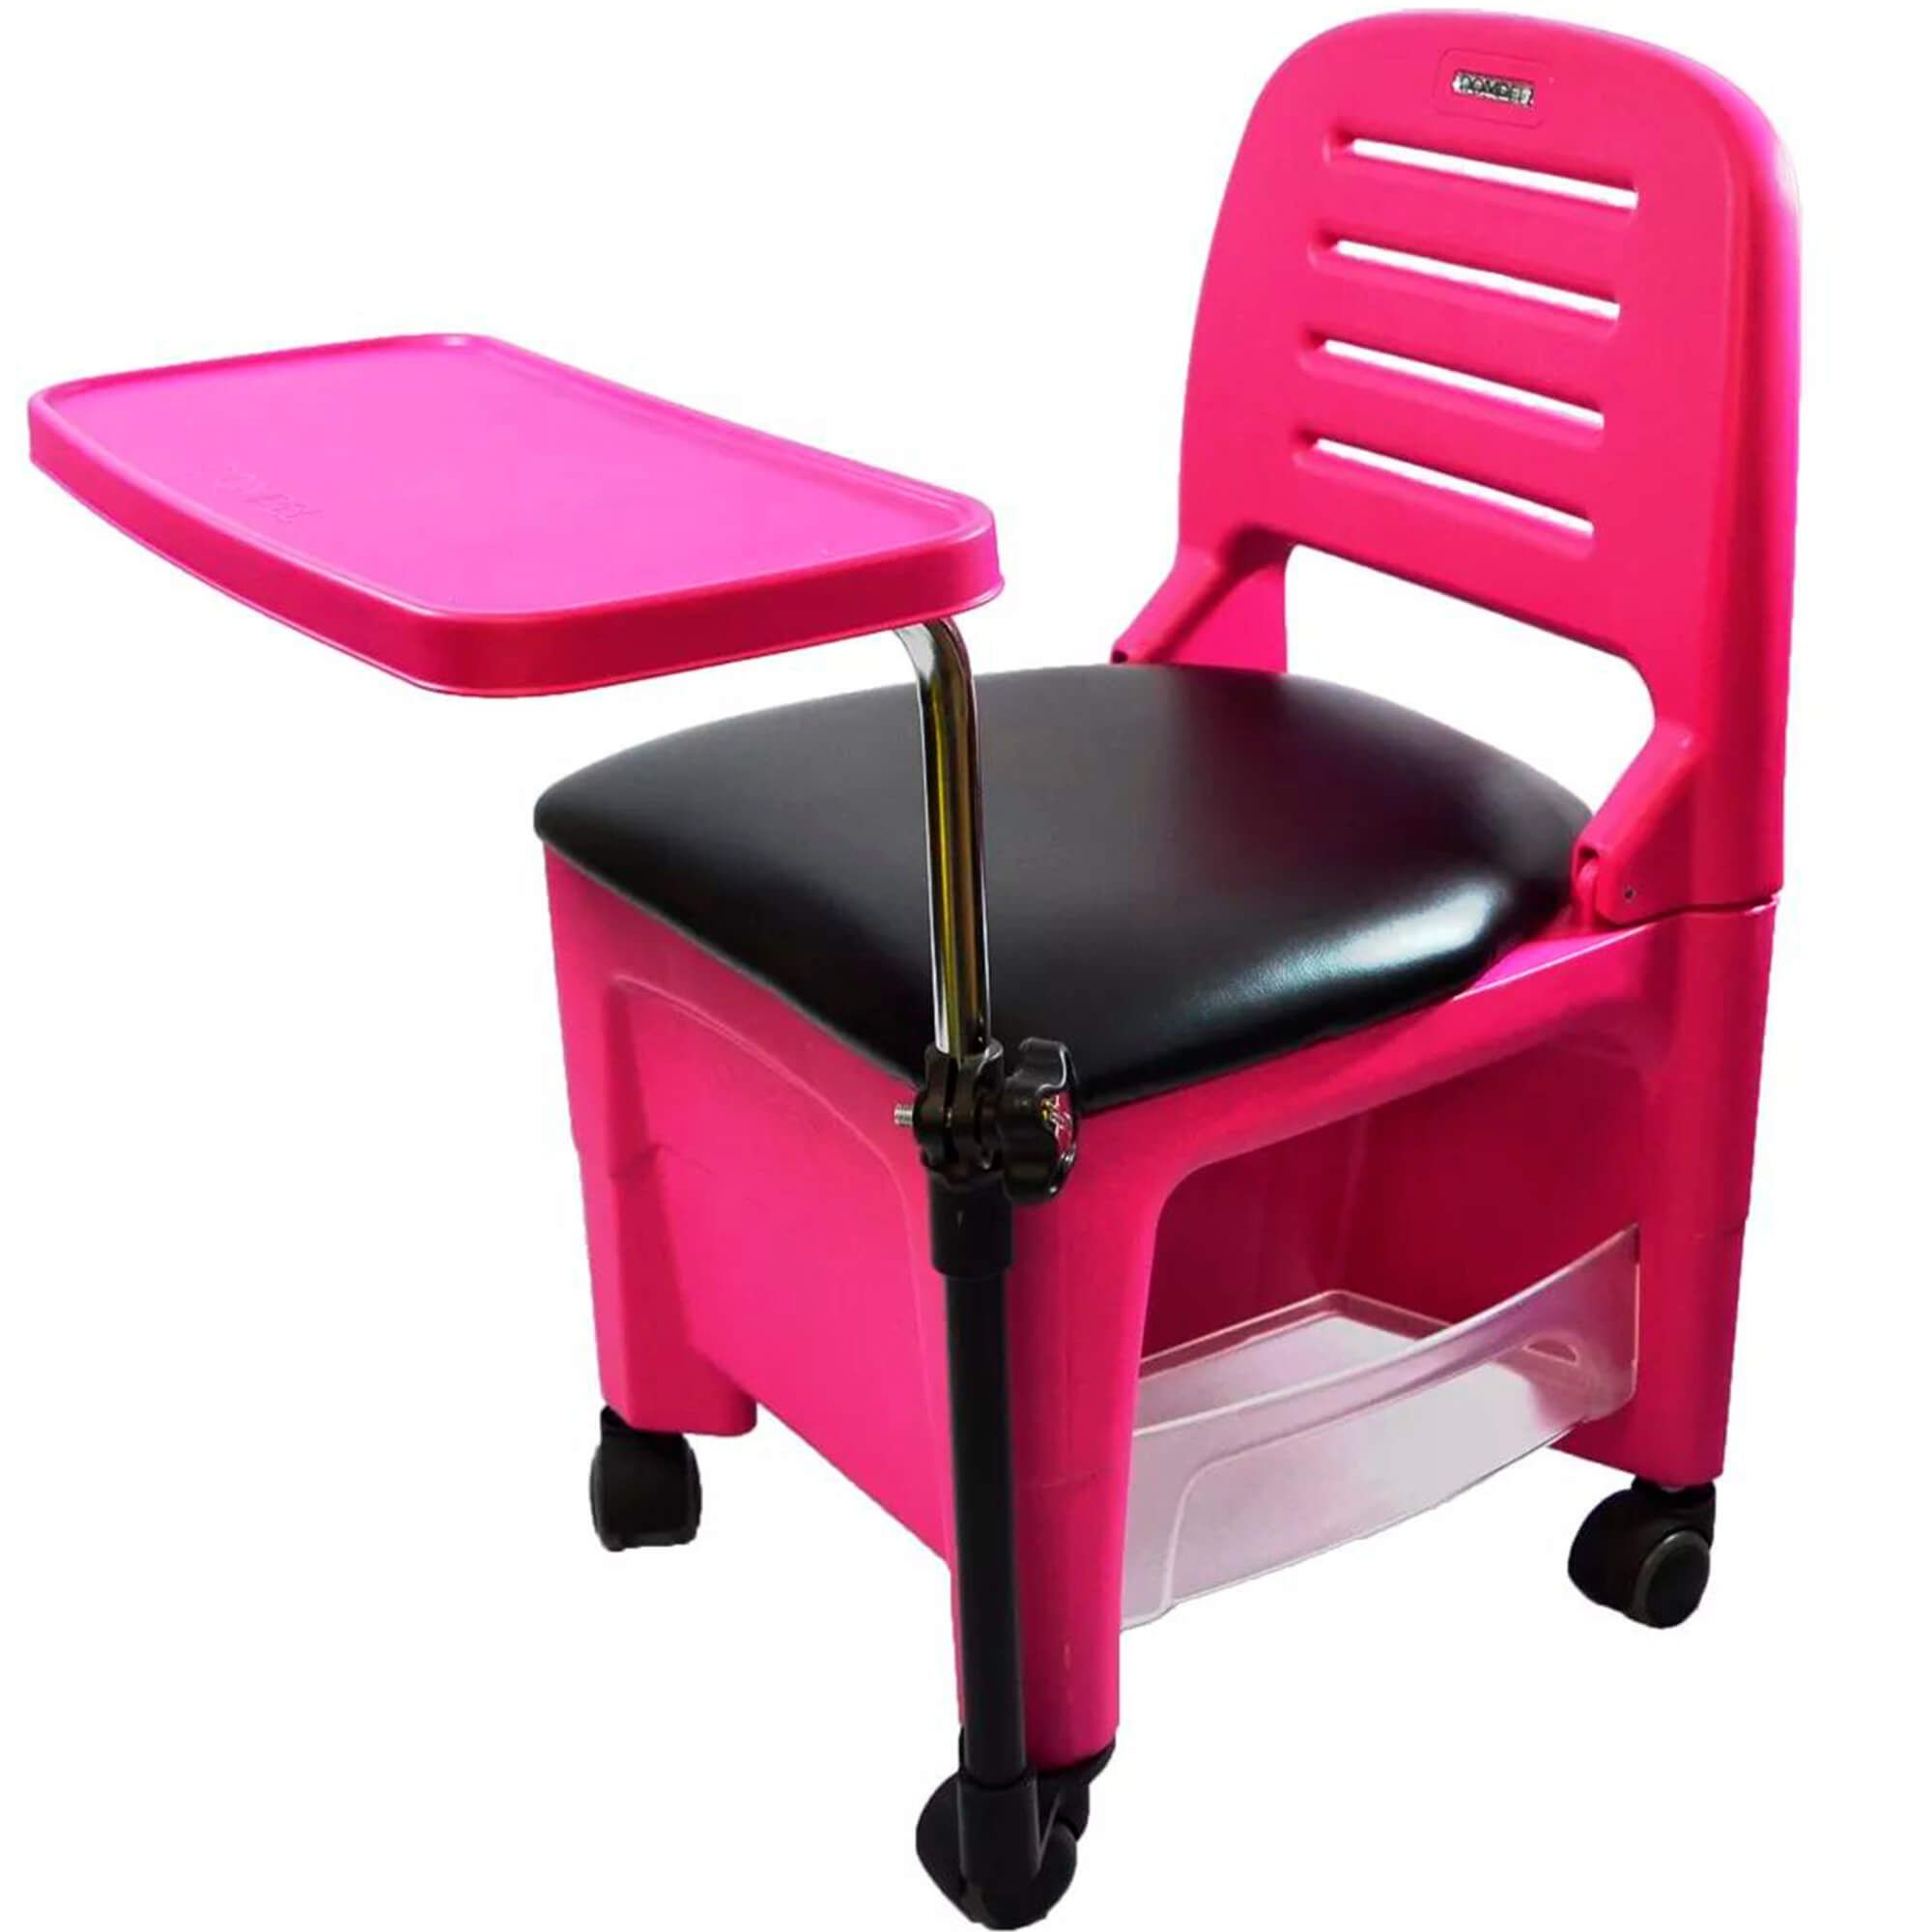 Cadeira Móvel Para Manicure - Dompel Ciranda (rosa)